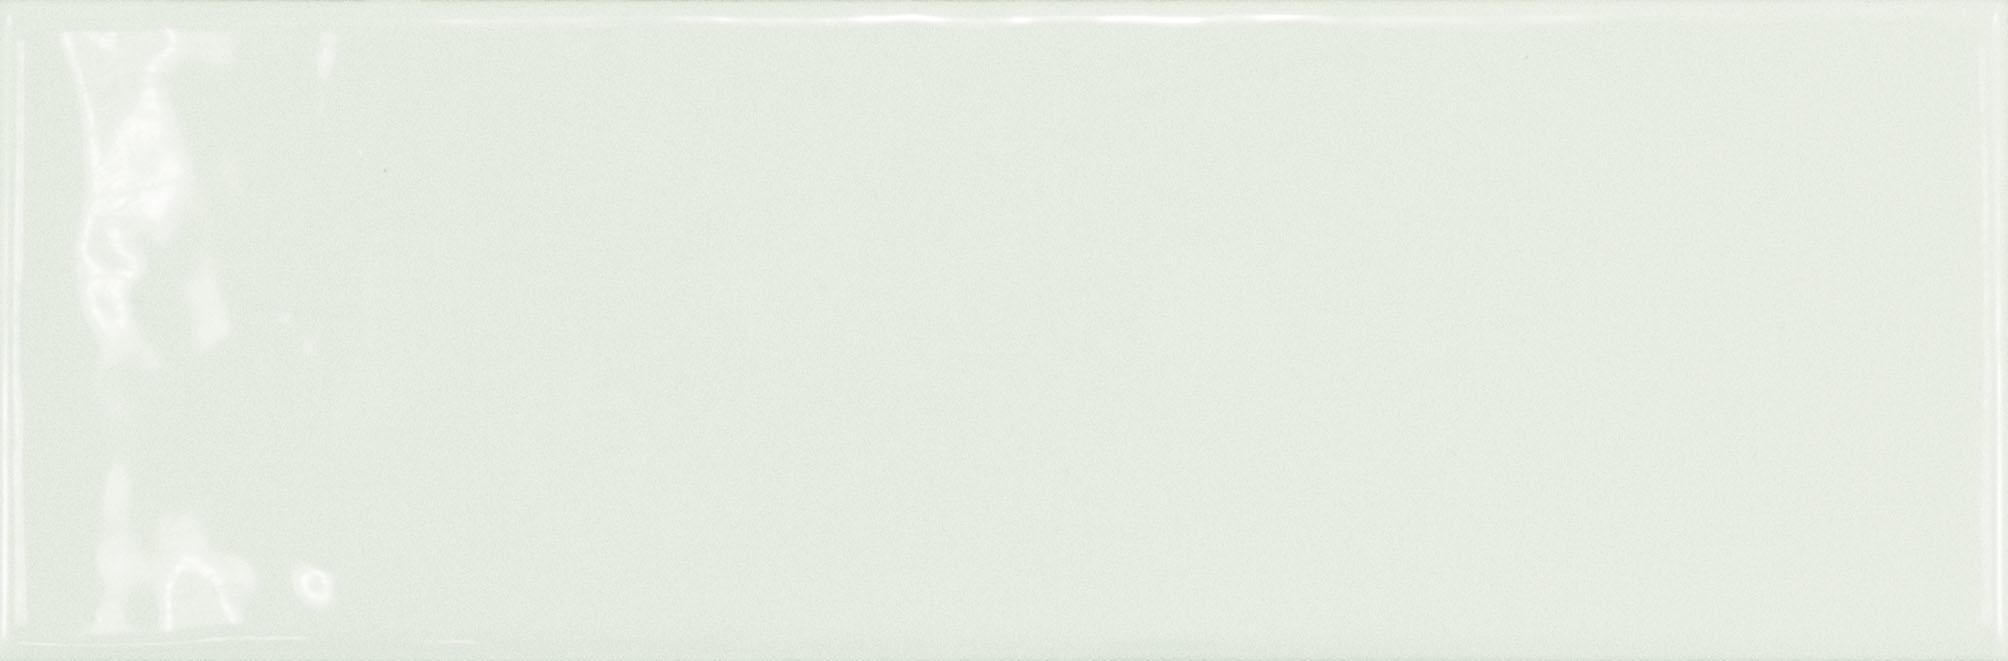 Country Blanco 6.5x40 cm